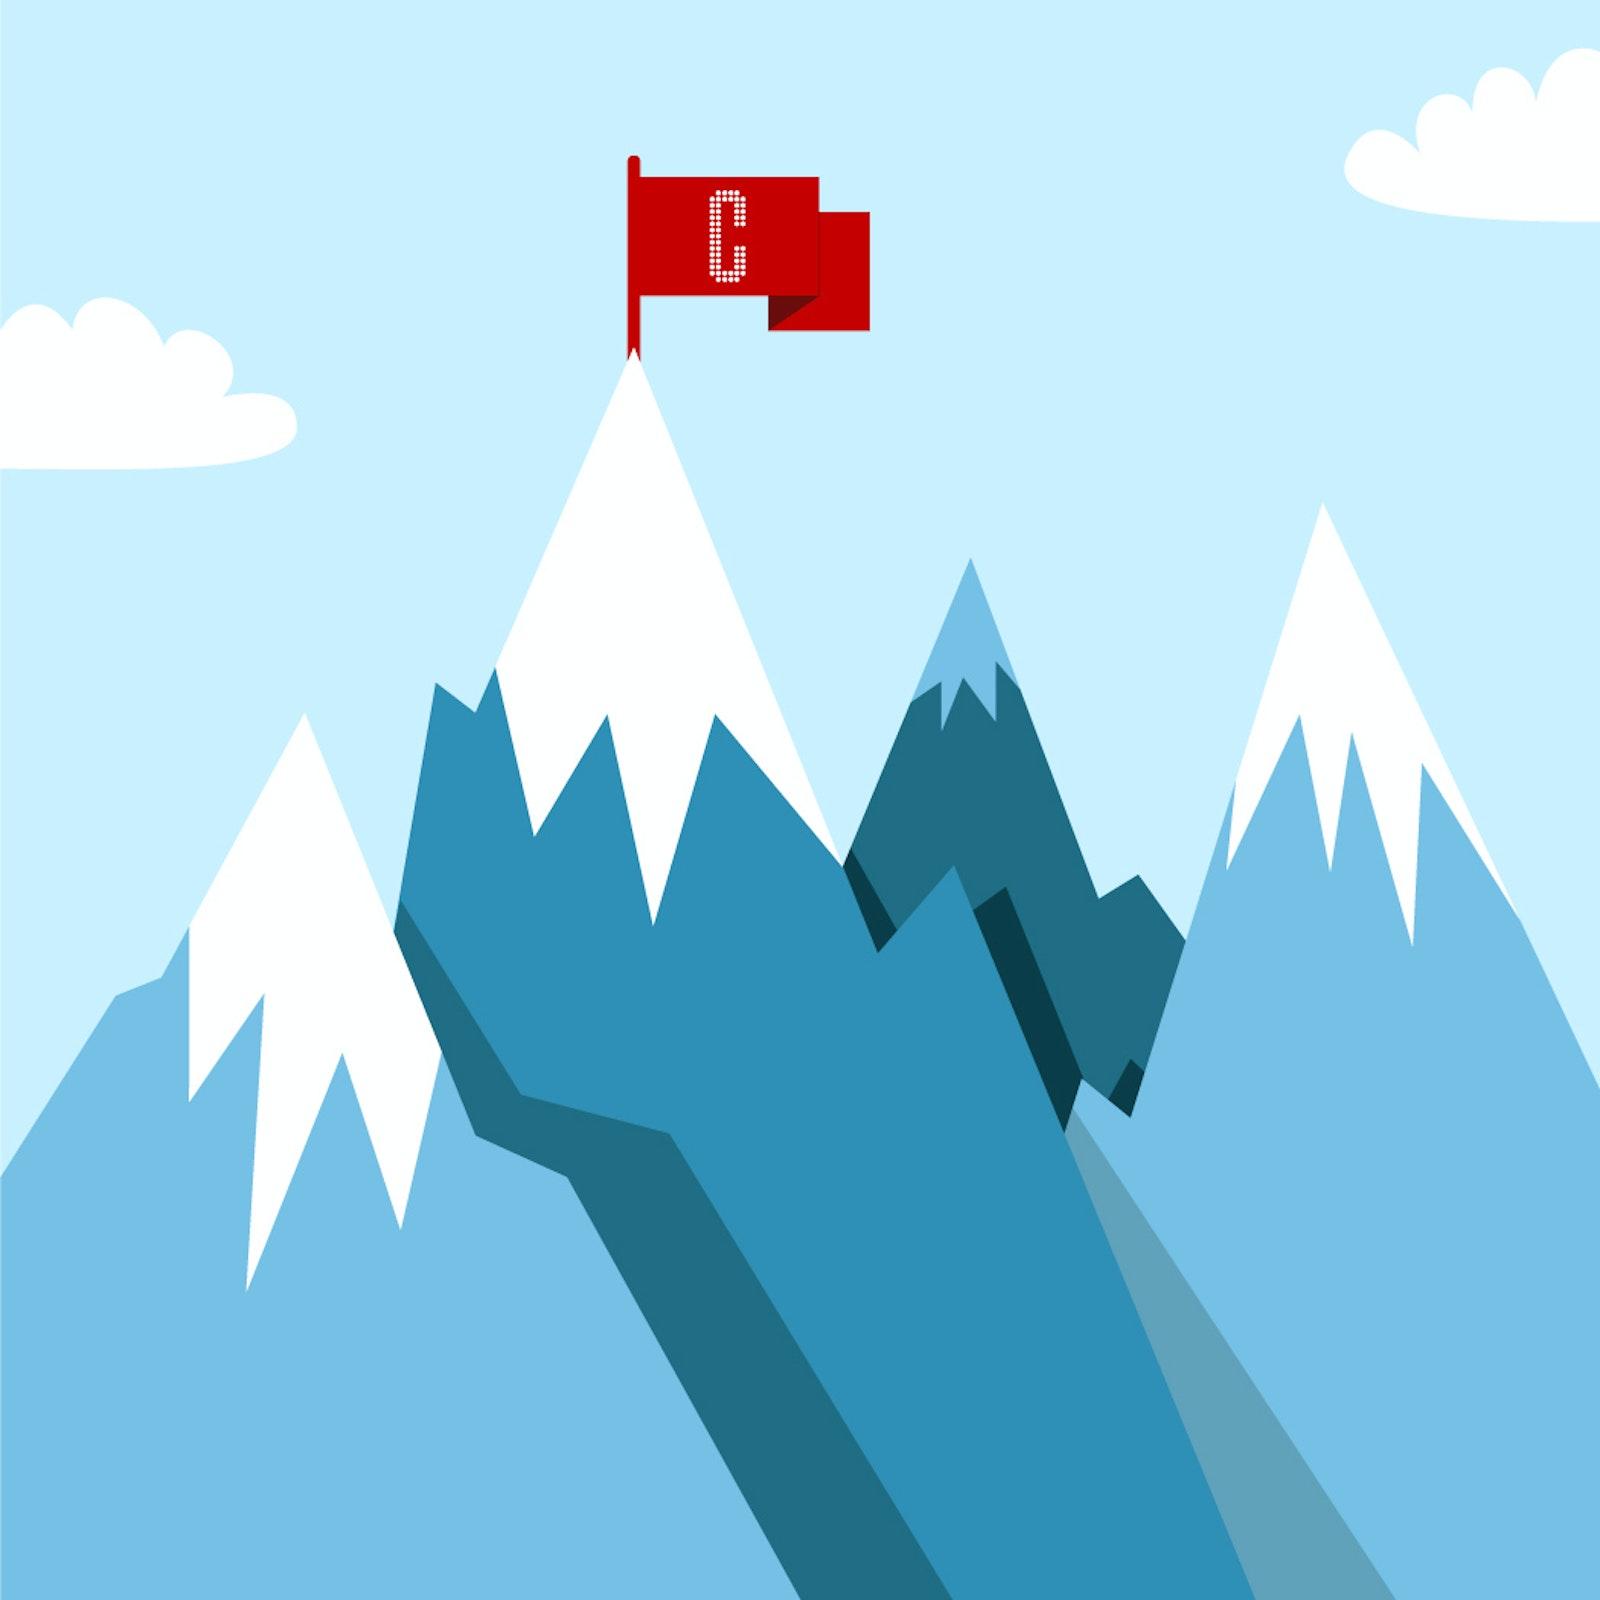 CAP mktgintern mountains